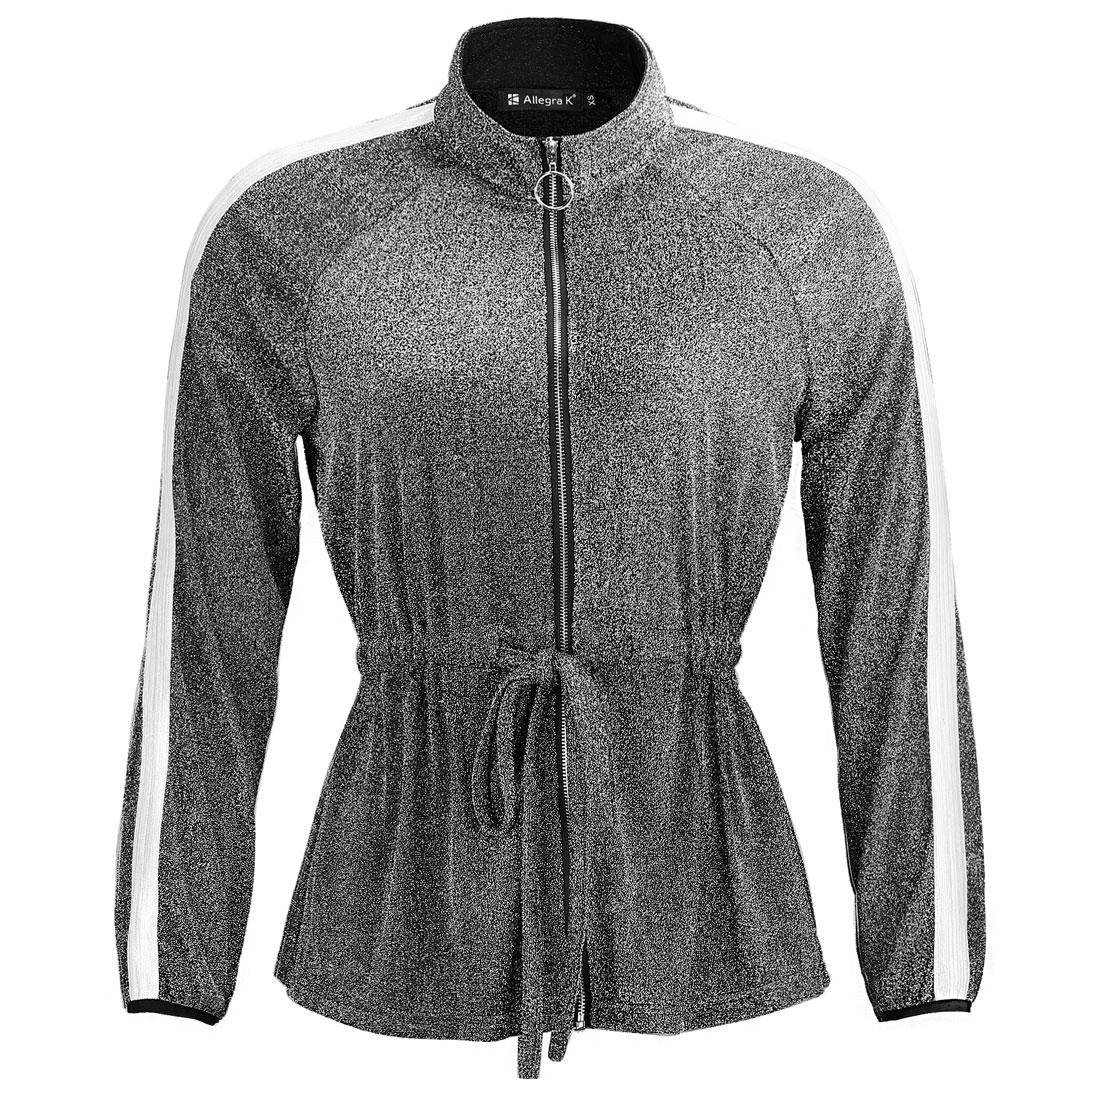 Women's Glitter Lightweight Zip Waist Drawstring Jacket Black M (US 10)